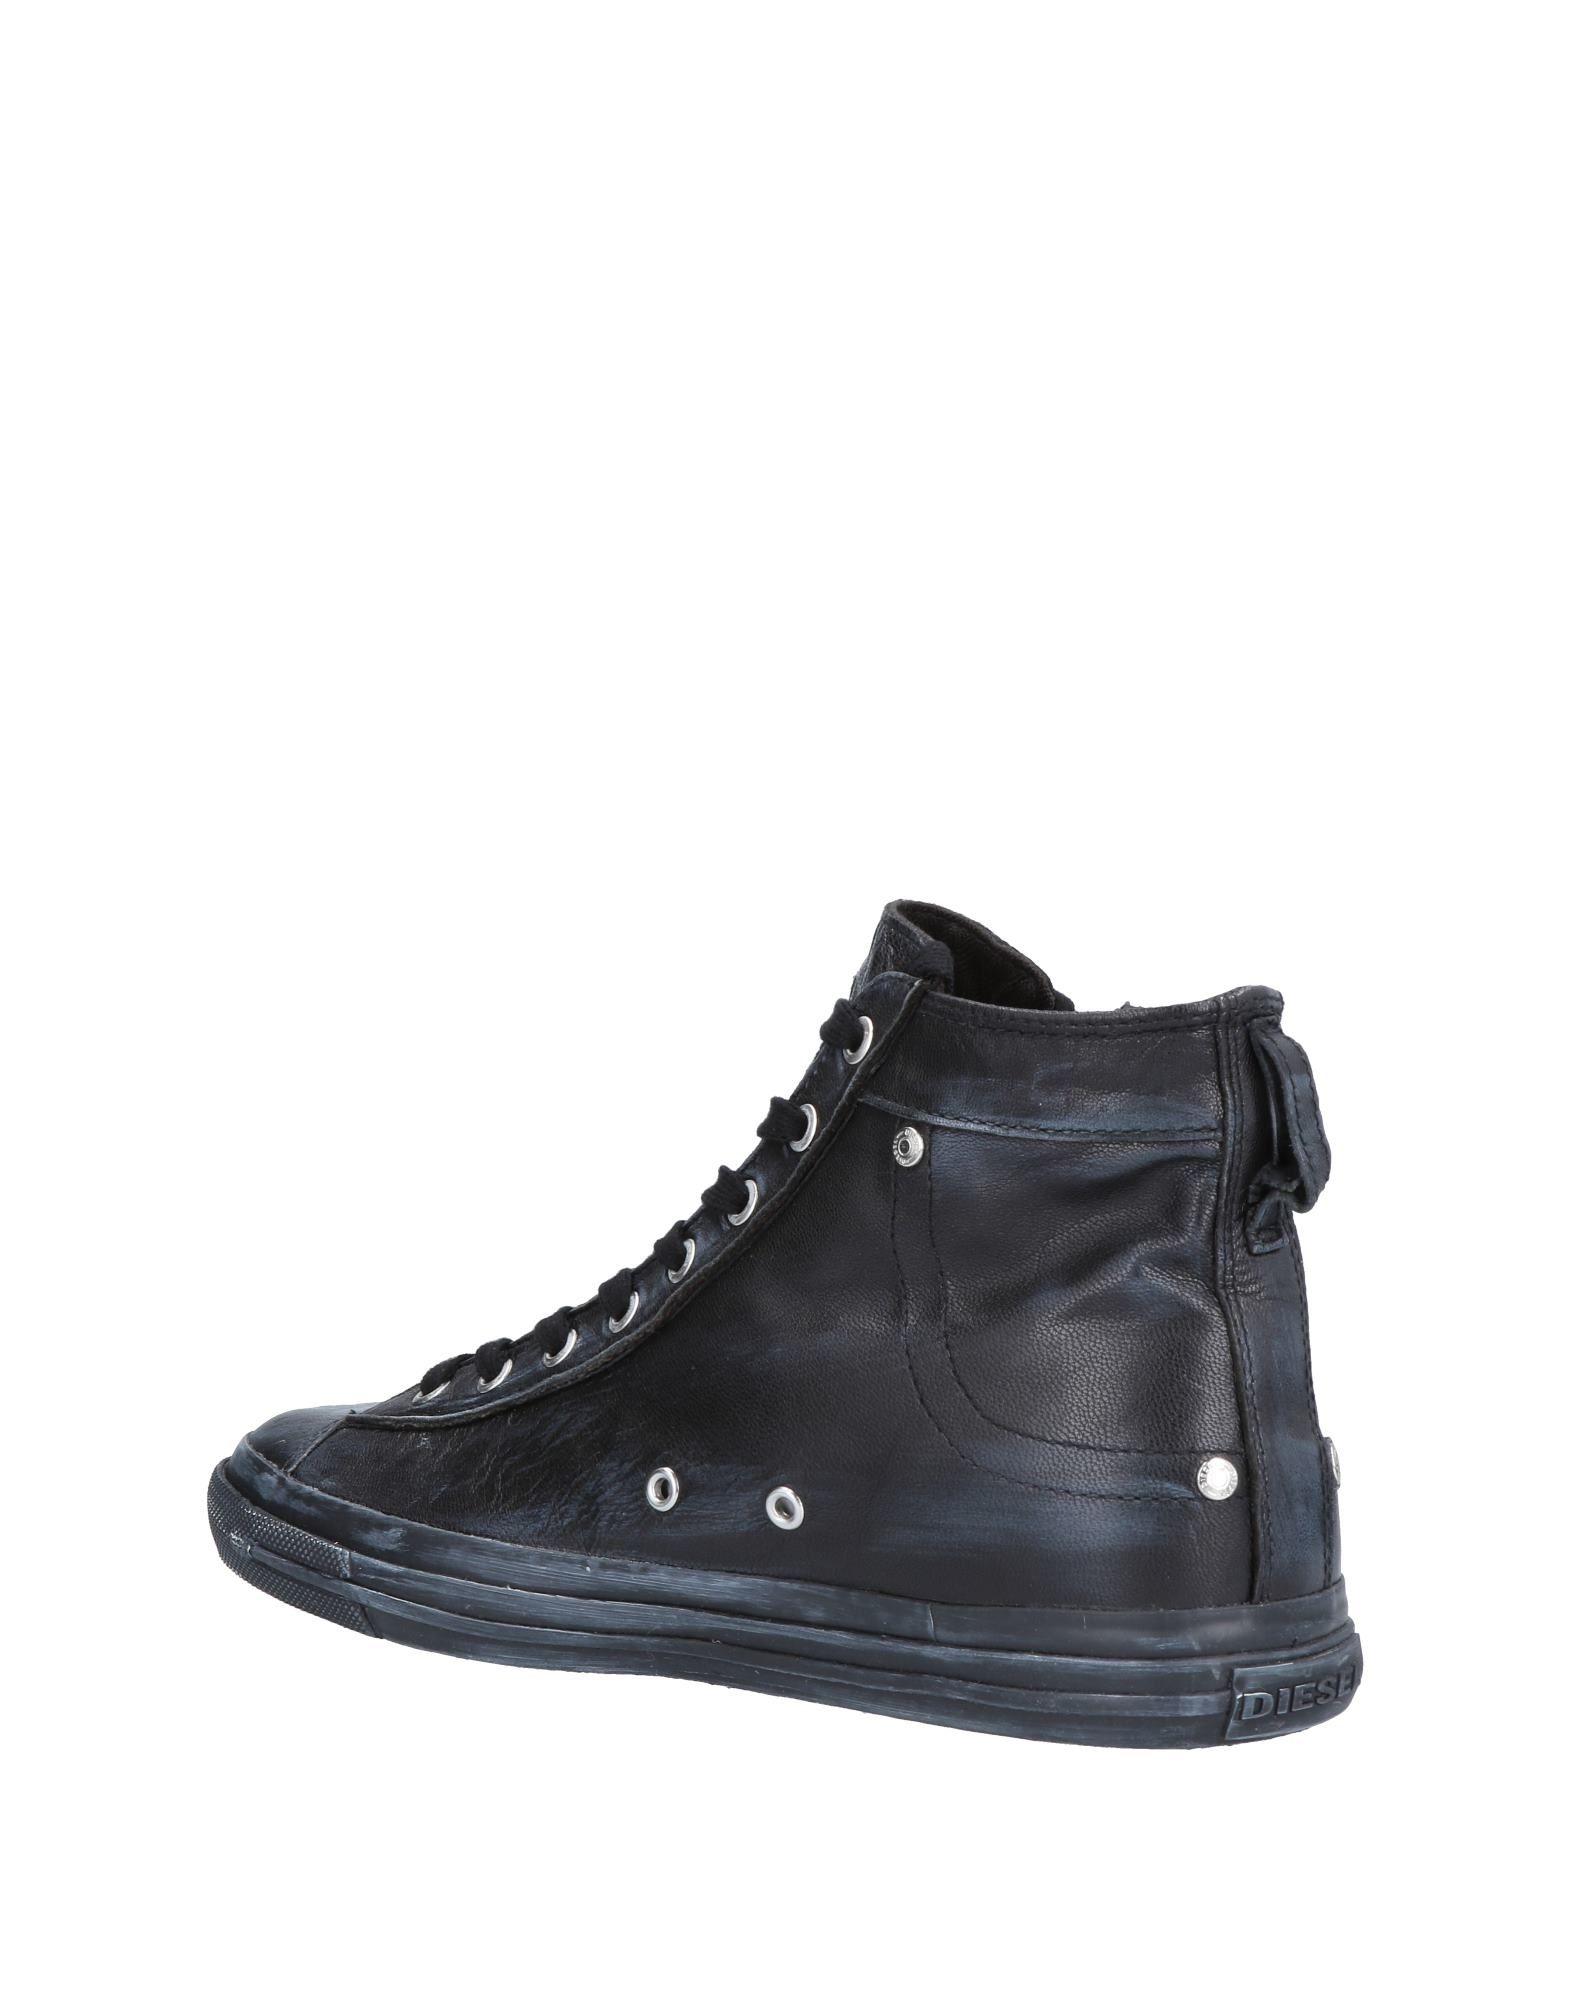 Rabatt Herren echte Schuhe Diesel Sneakers Herren Rabatt  11496848RU 515e3e